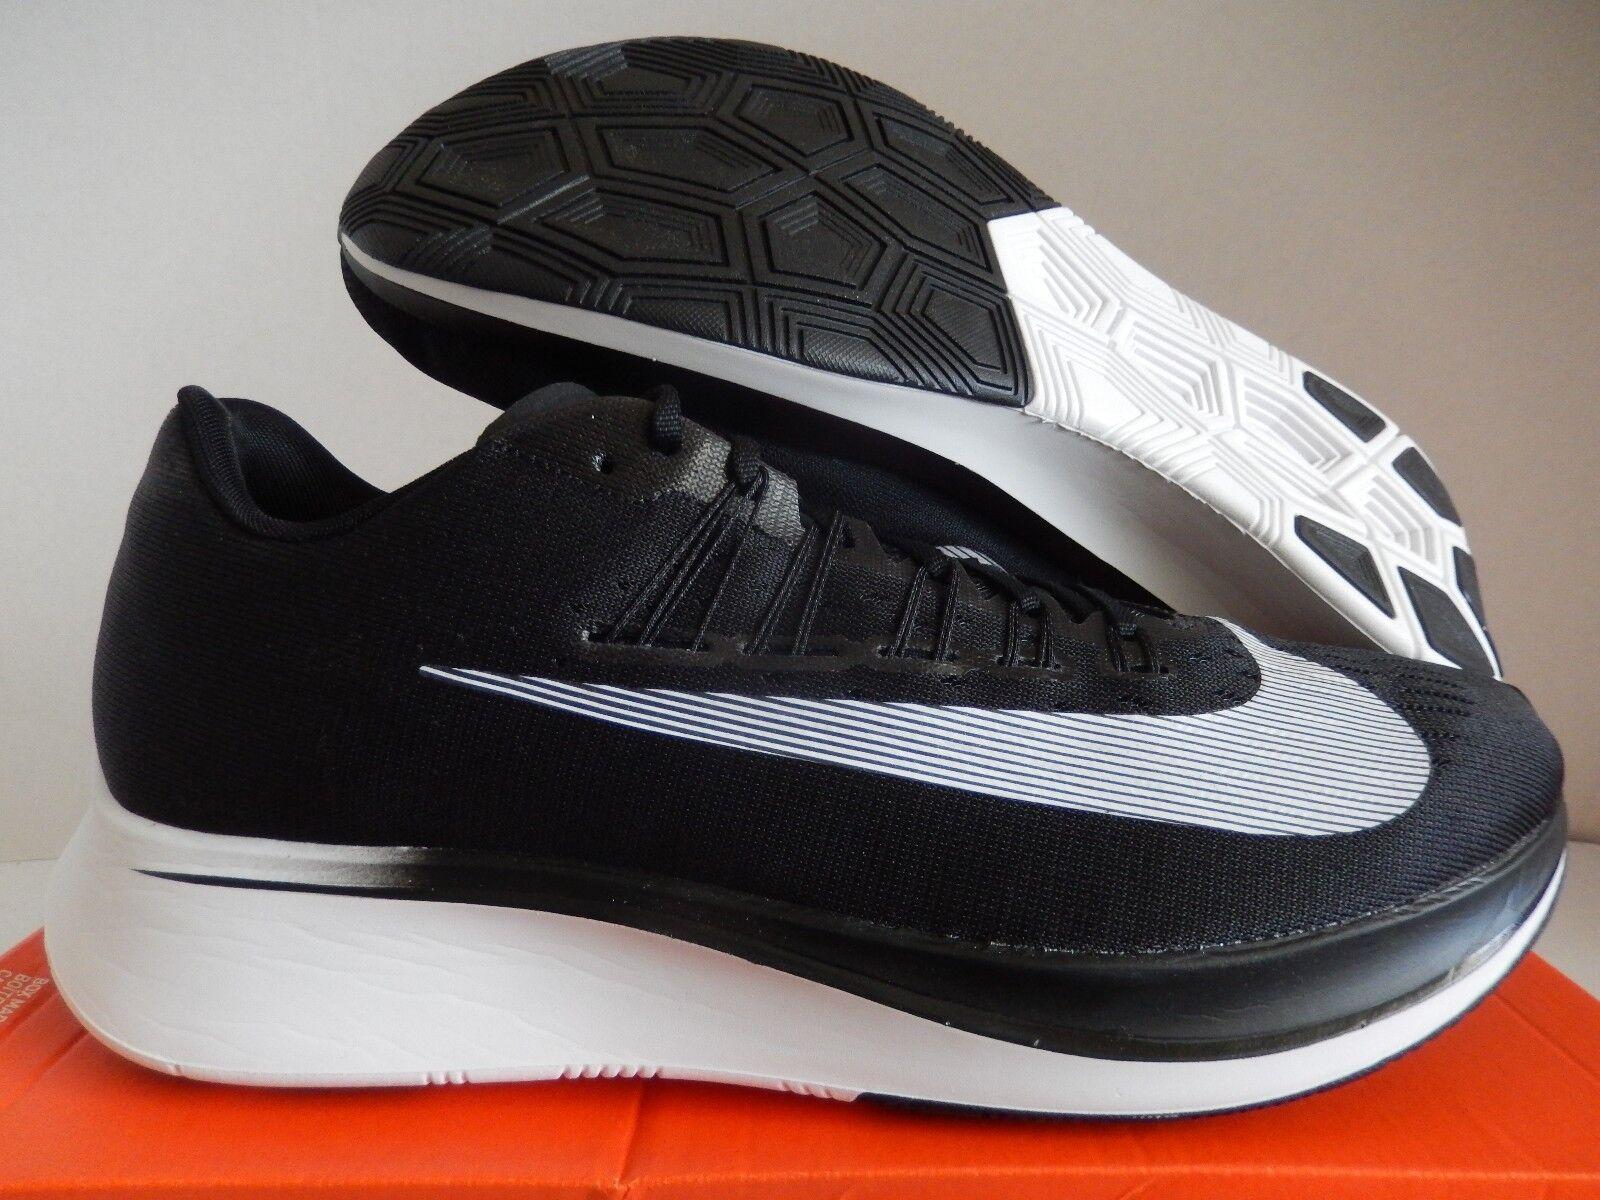 Nike zoom volare nero-white-anthracite sz [880848-001] 9 [880848-001] sz 69cef6